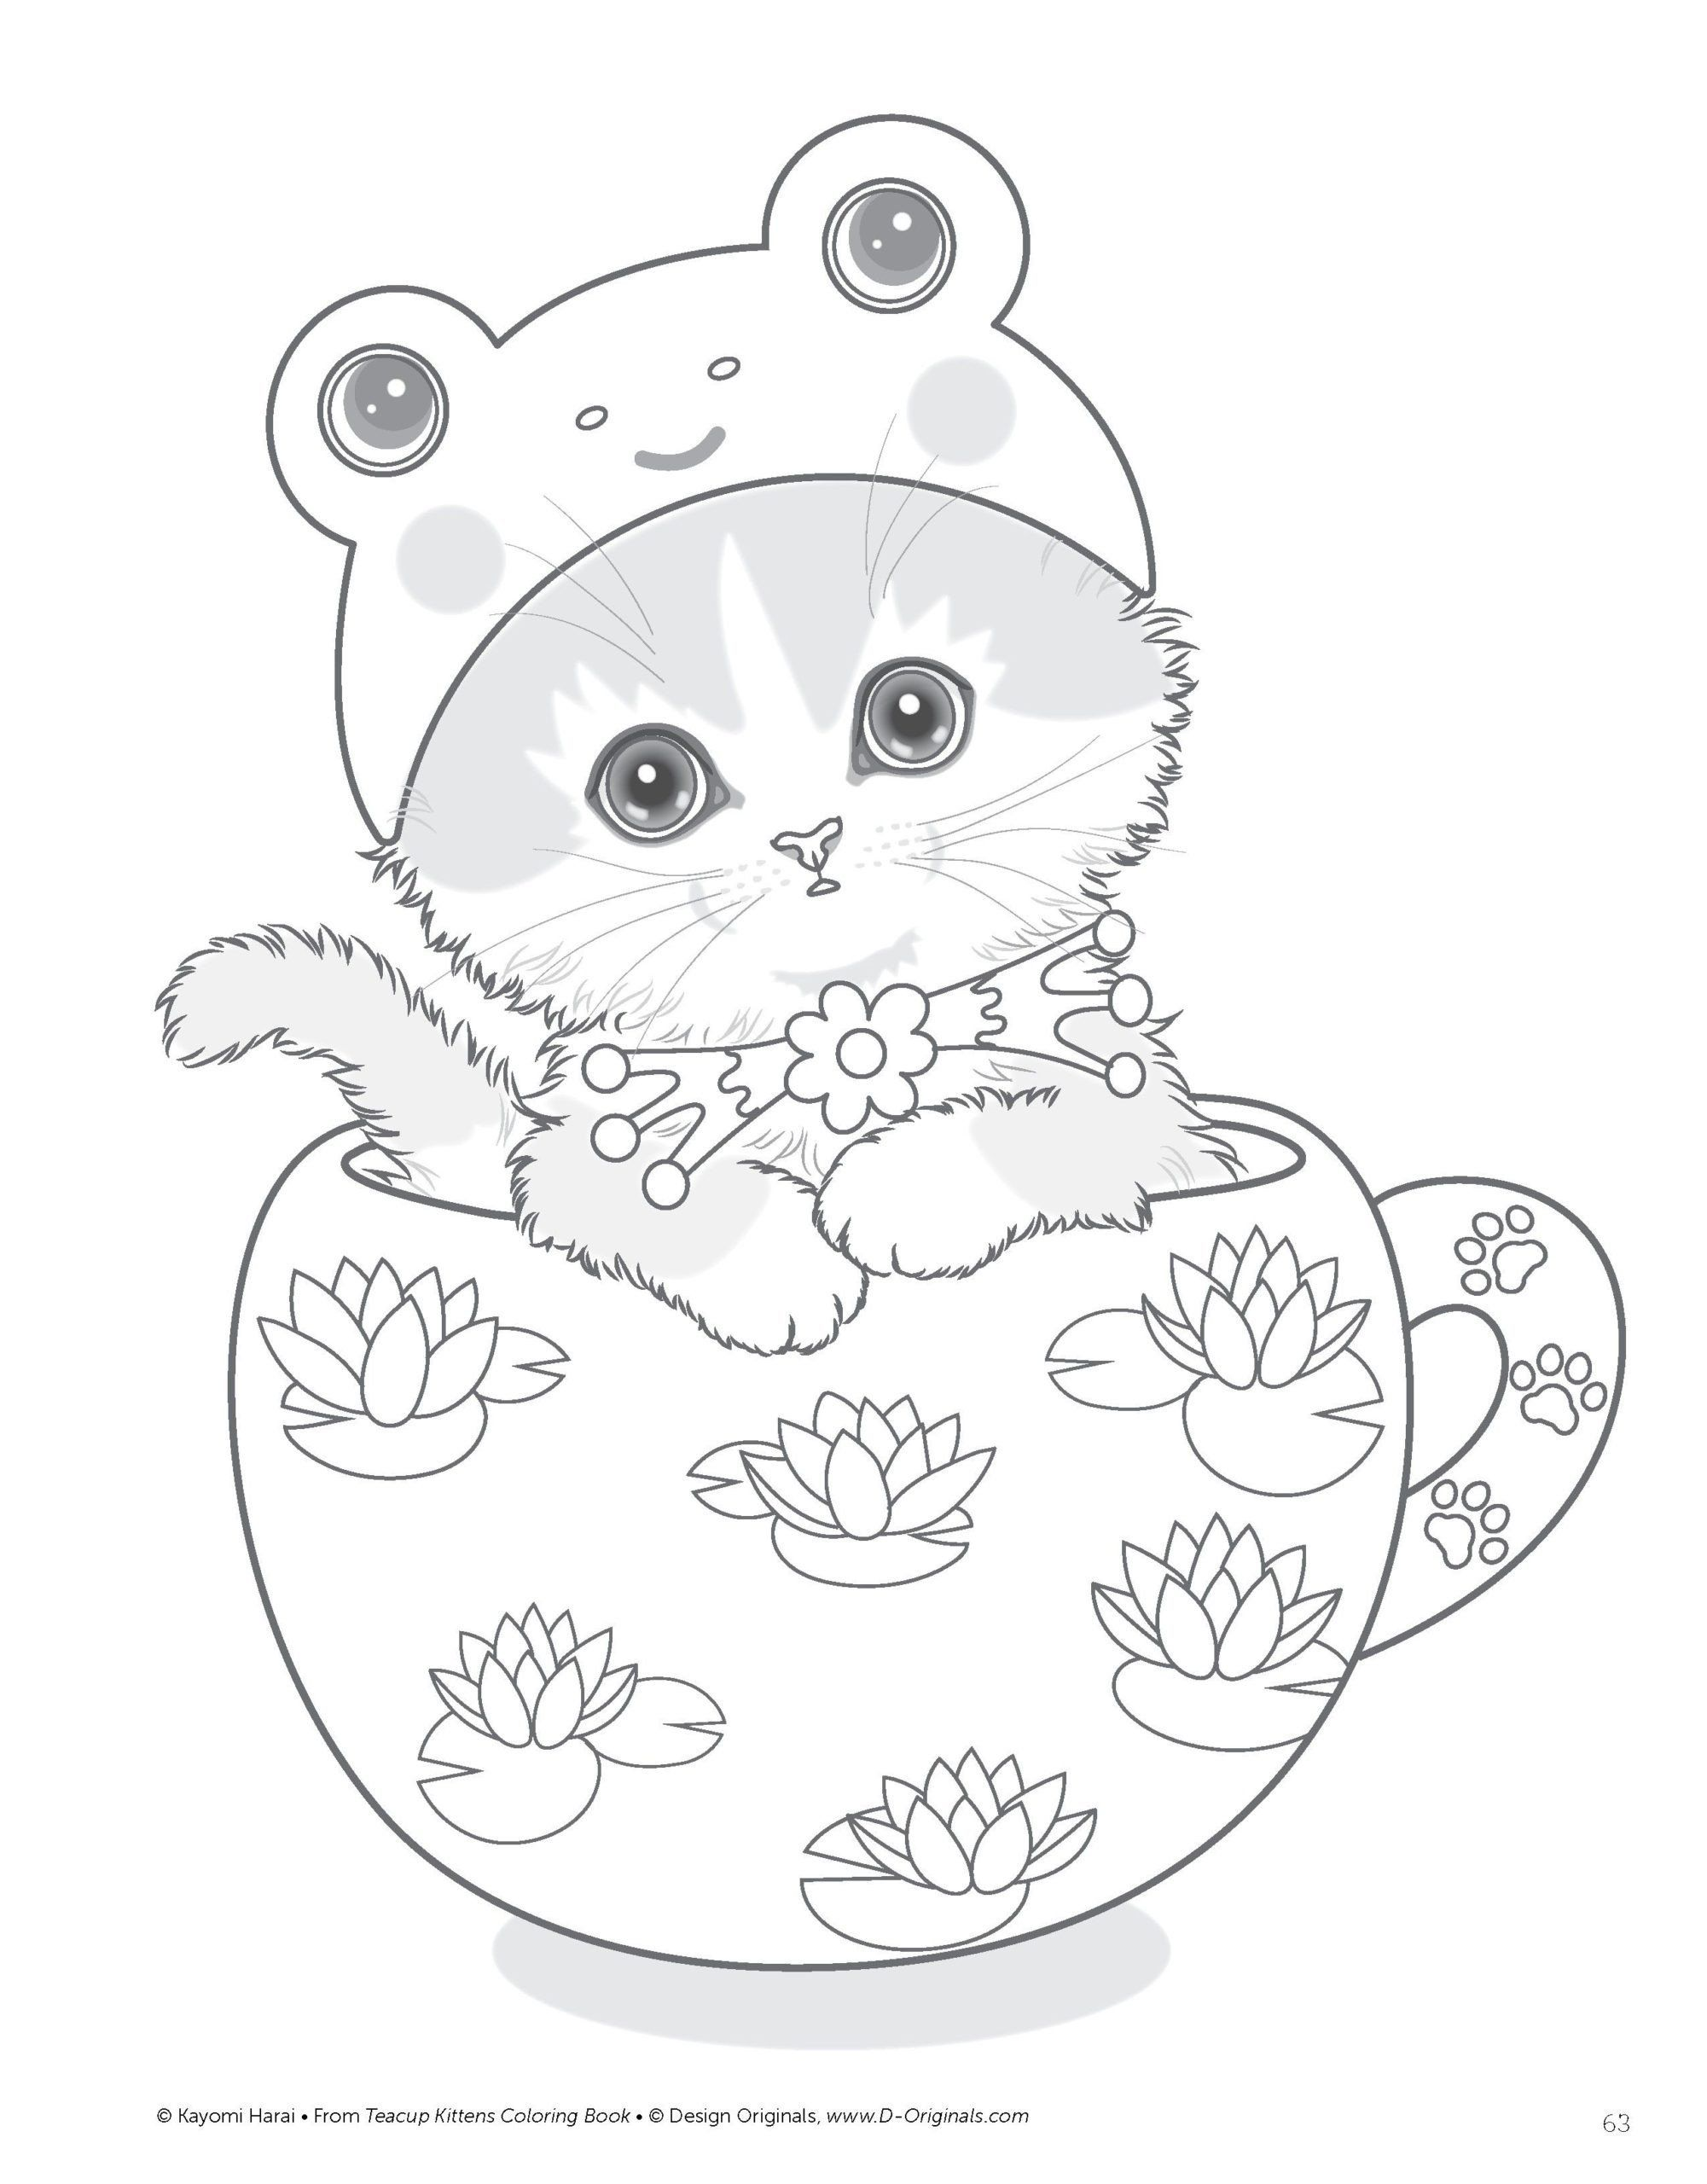 Cat Coloring Pages Free Coloring Pages Coloring Book Printable Cat And Kitten Free Kitten Coloring Book Kittens Coloring Cat Coloring Book